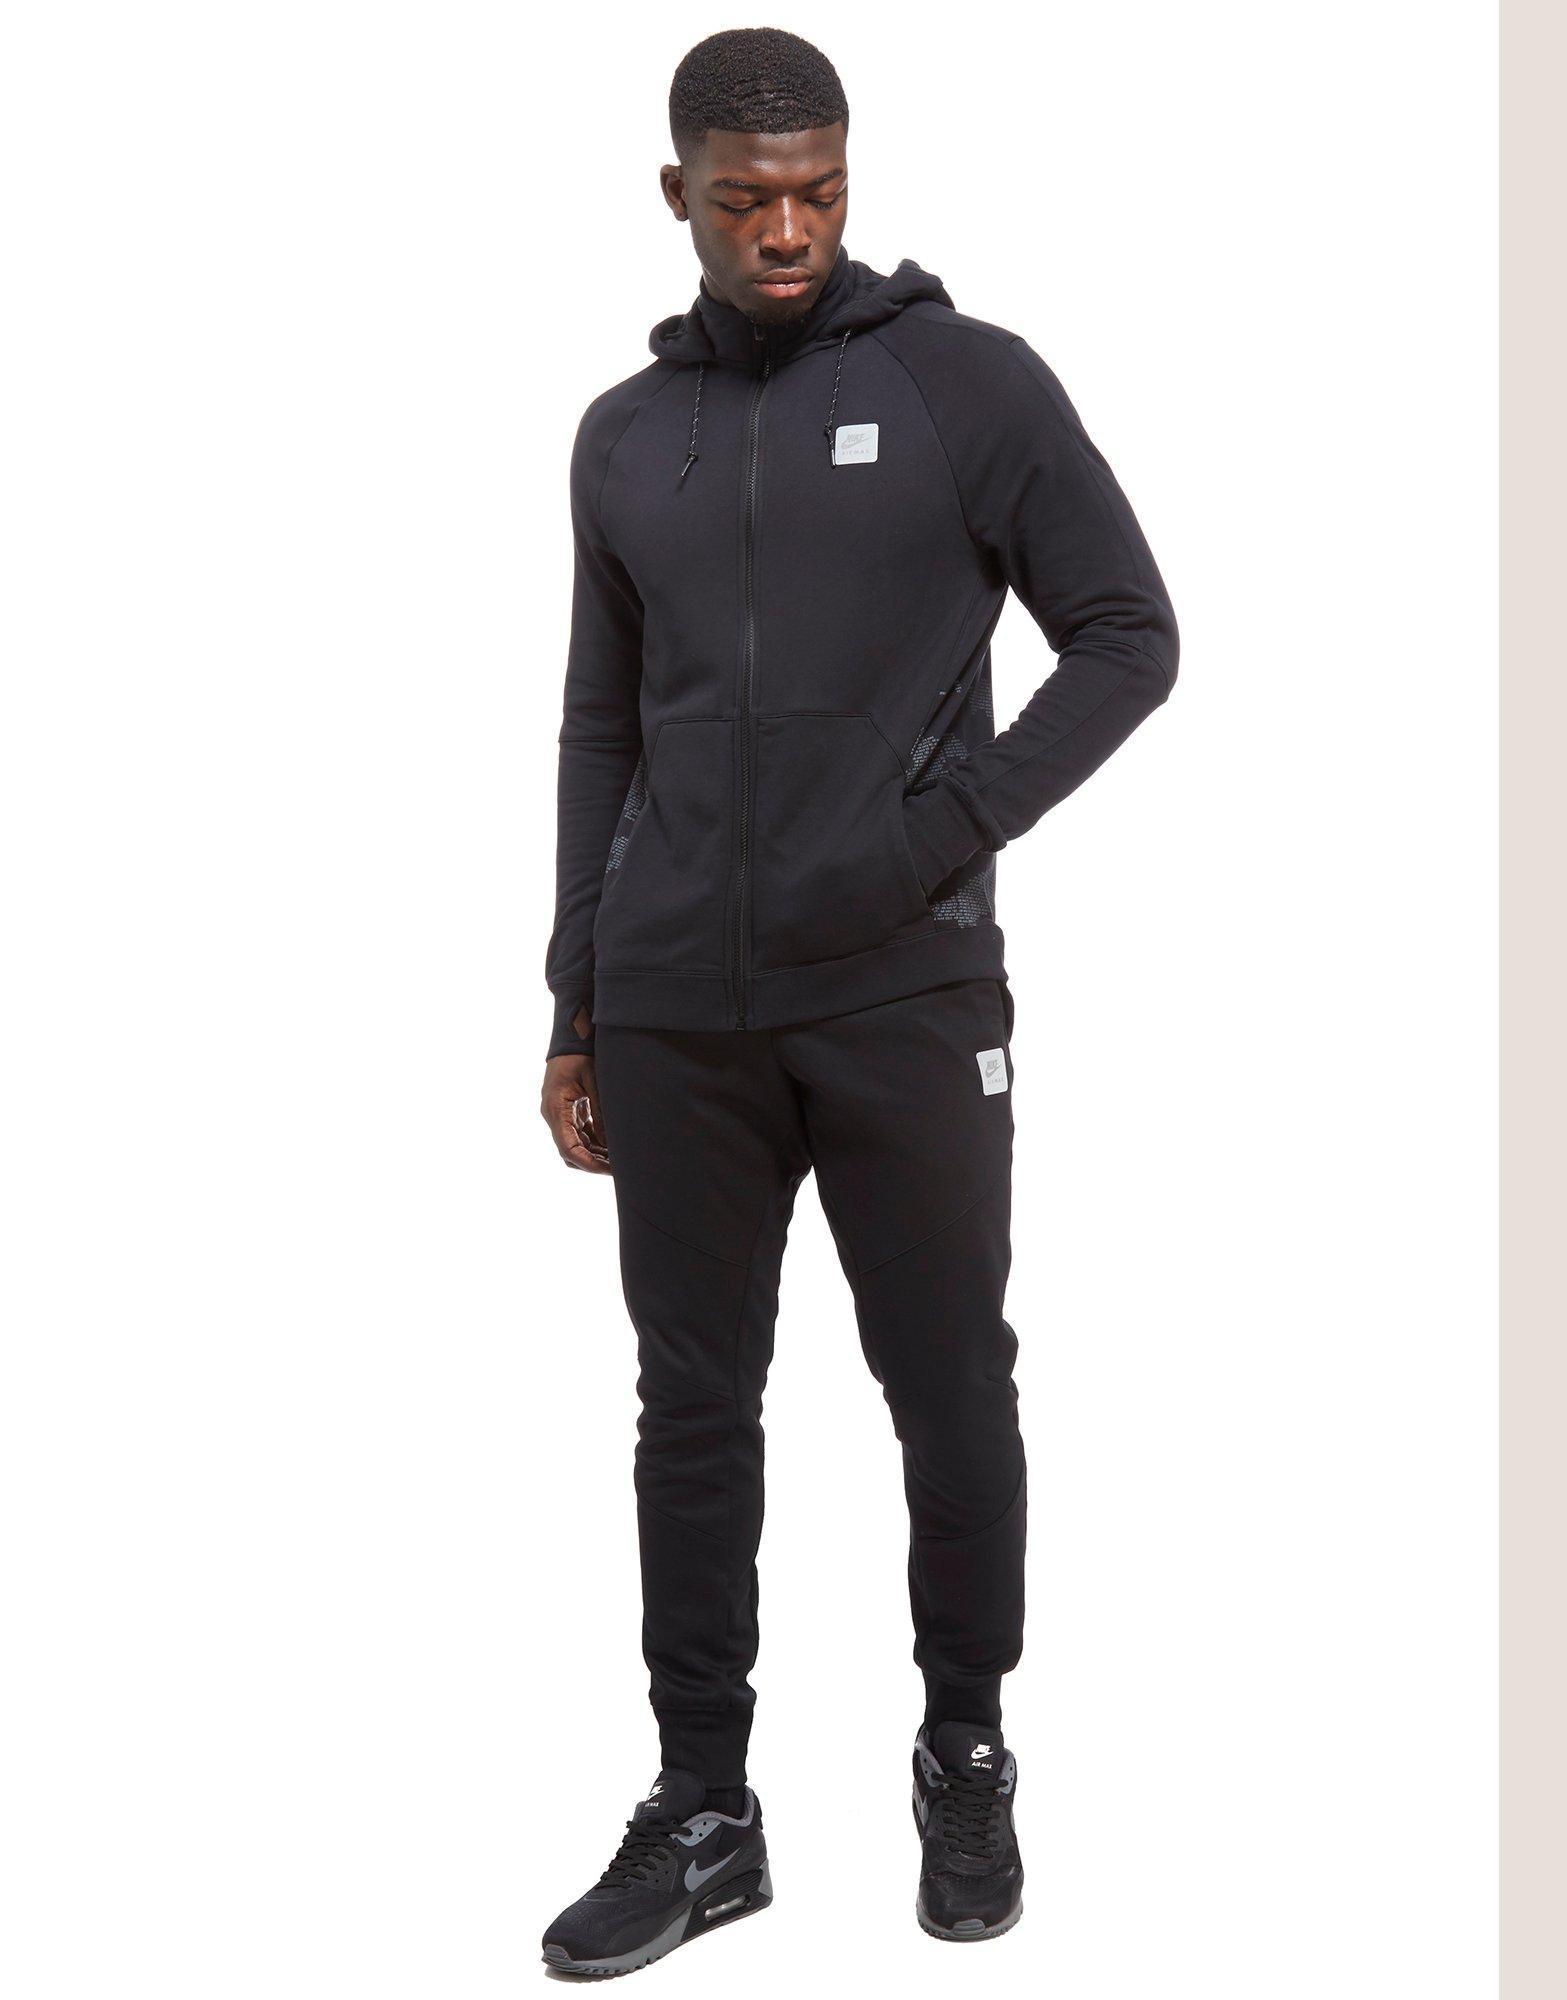 Men's Black Air Max Ft Full Zip Hoodie